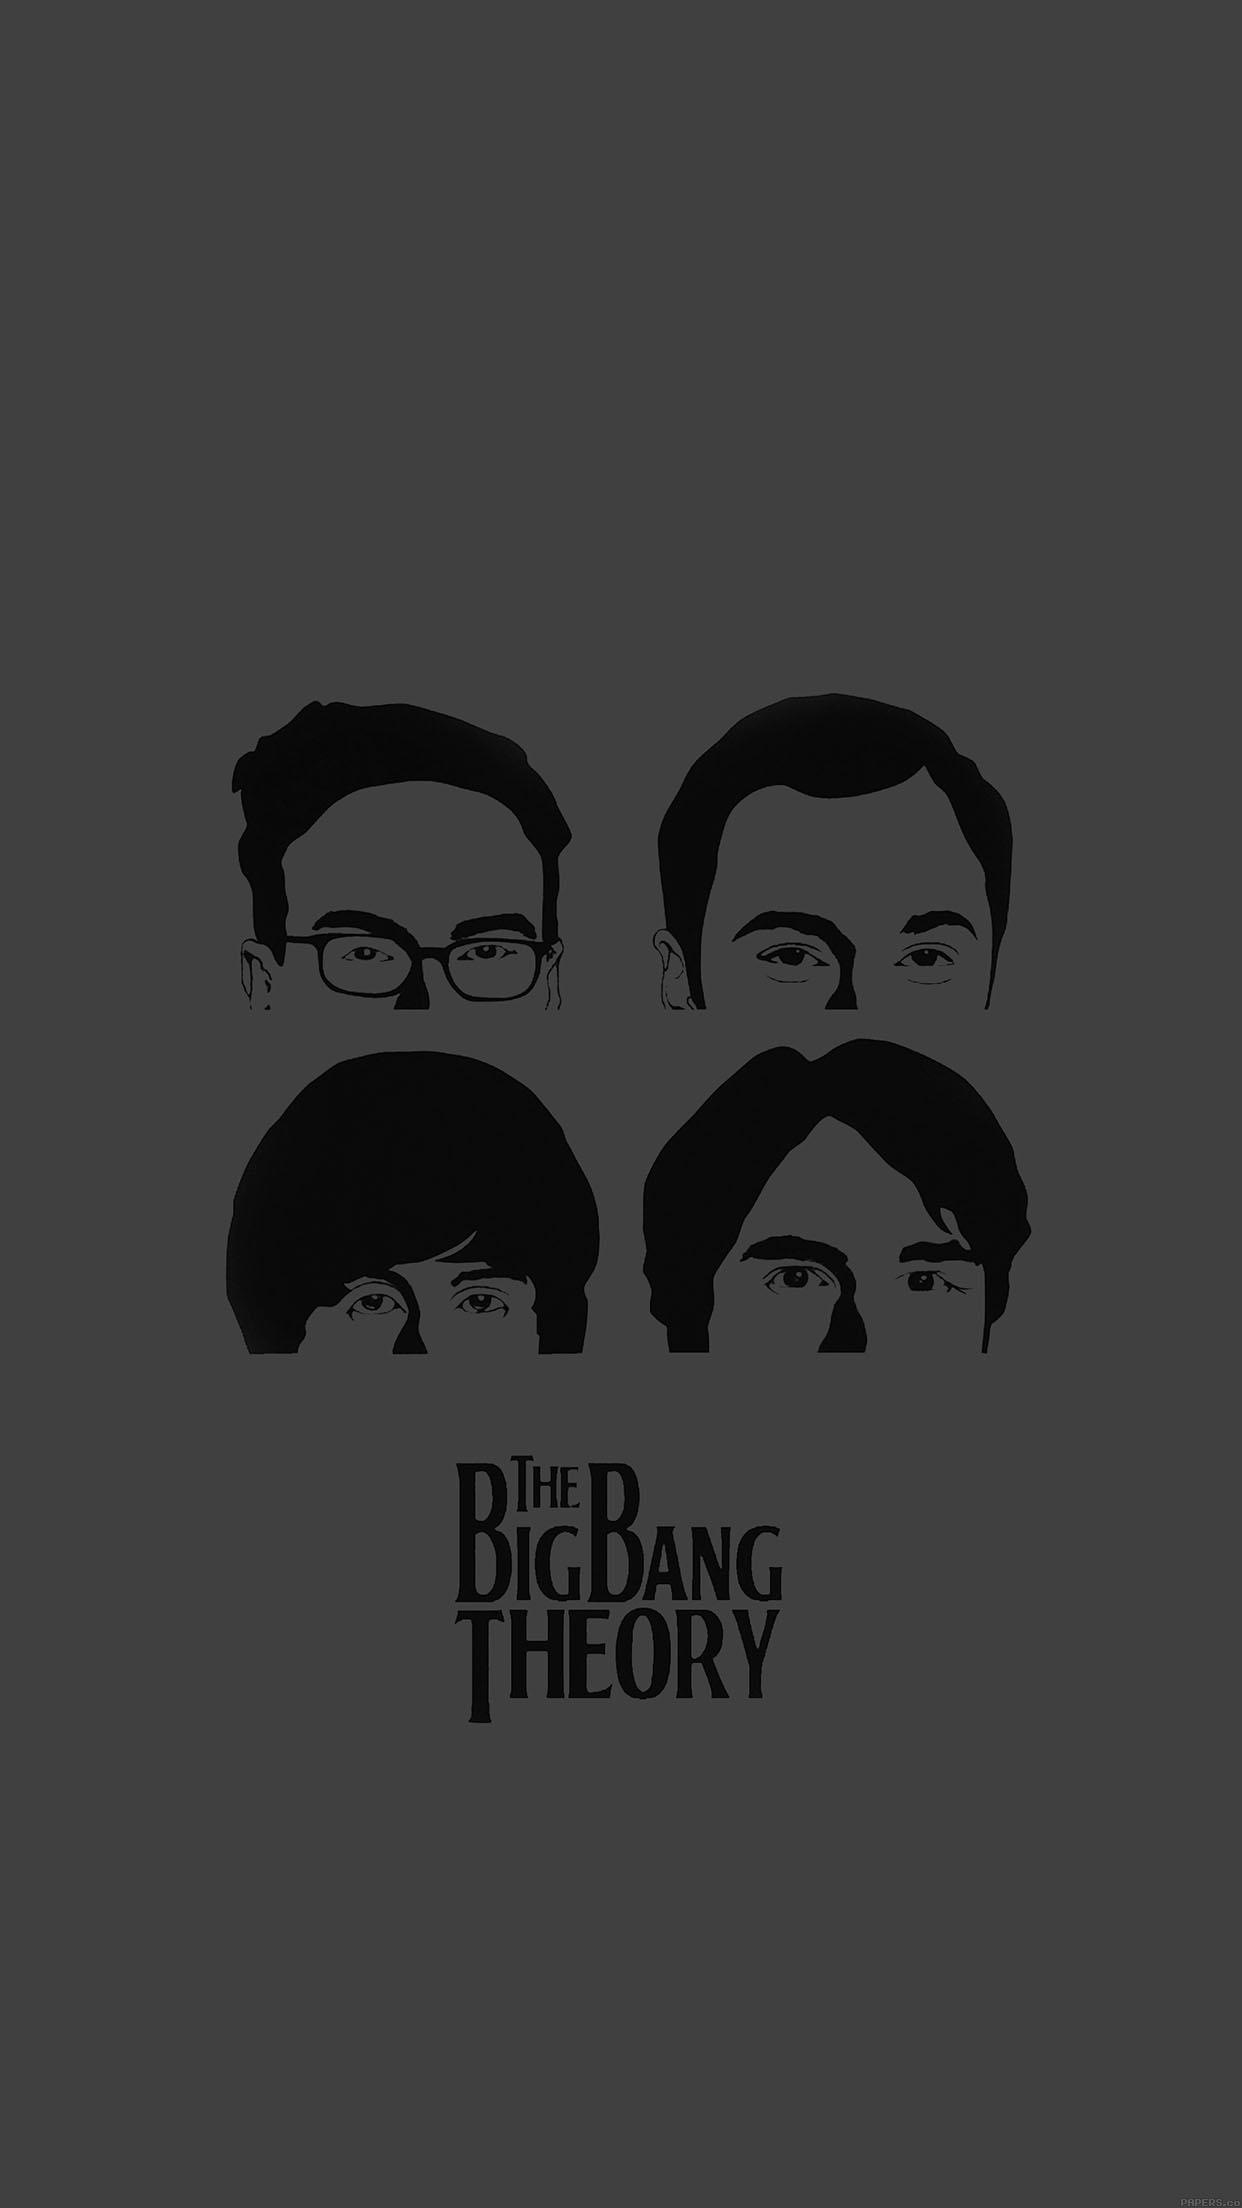 Big Bang Iphone Wallpaper Posted By Ryan Sellers